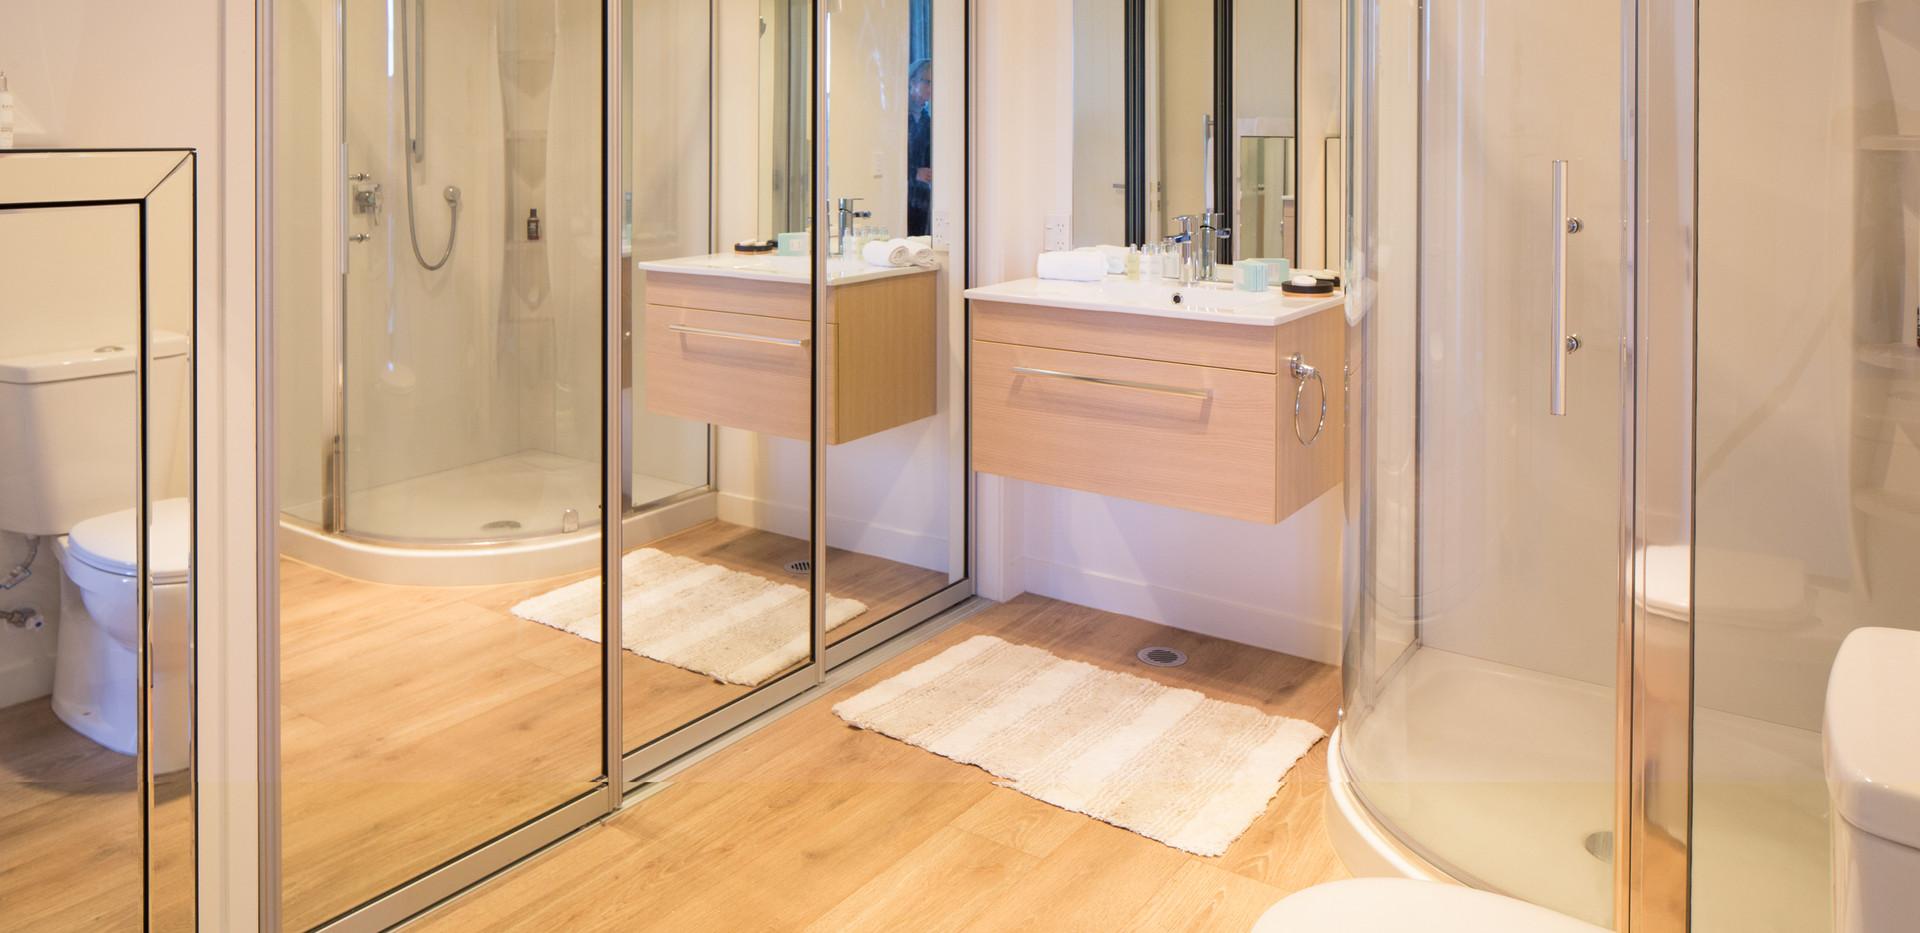 Goldrush 2 Bedroom Apartment, Queenstown Stays